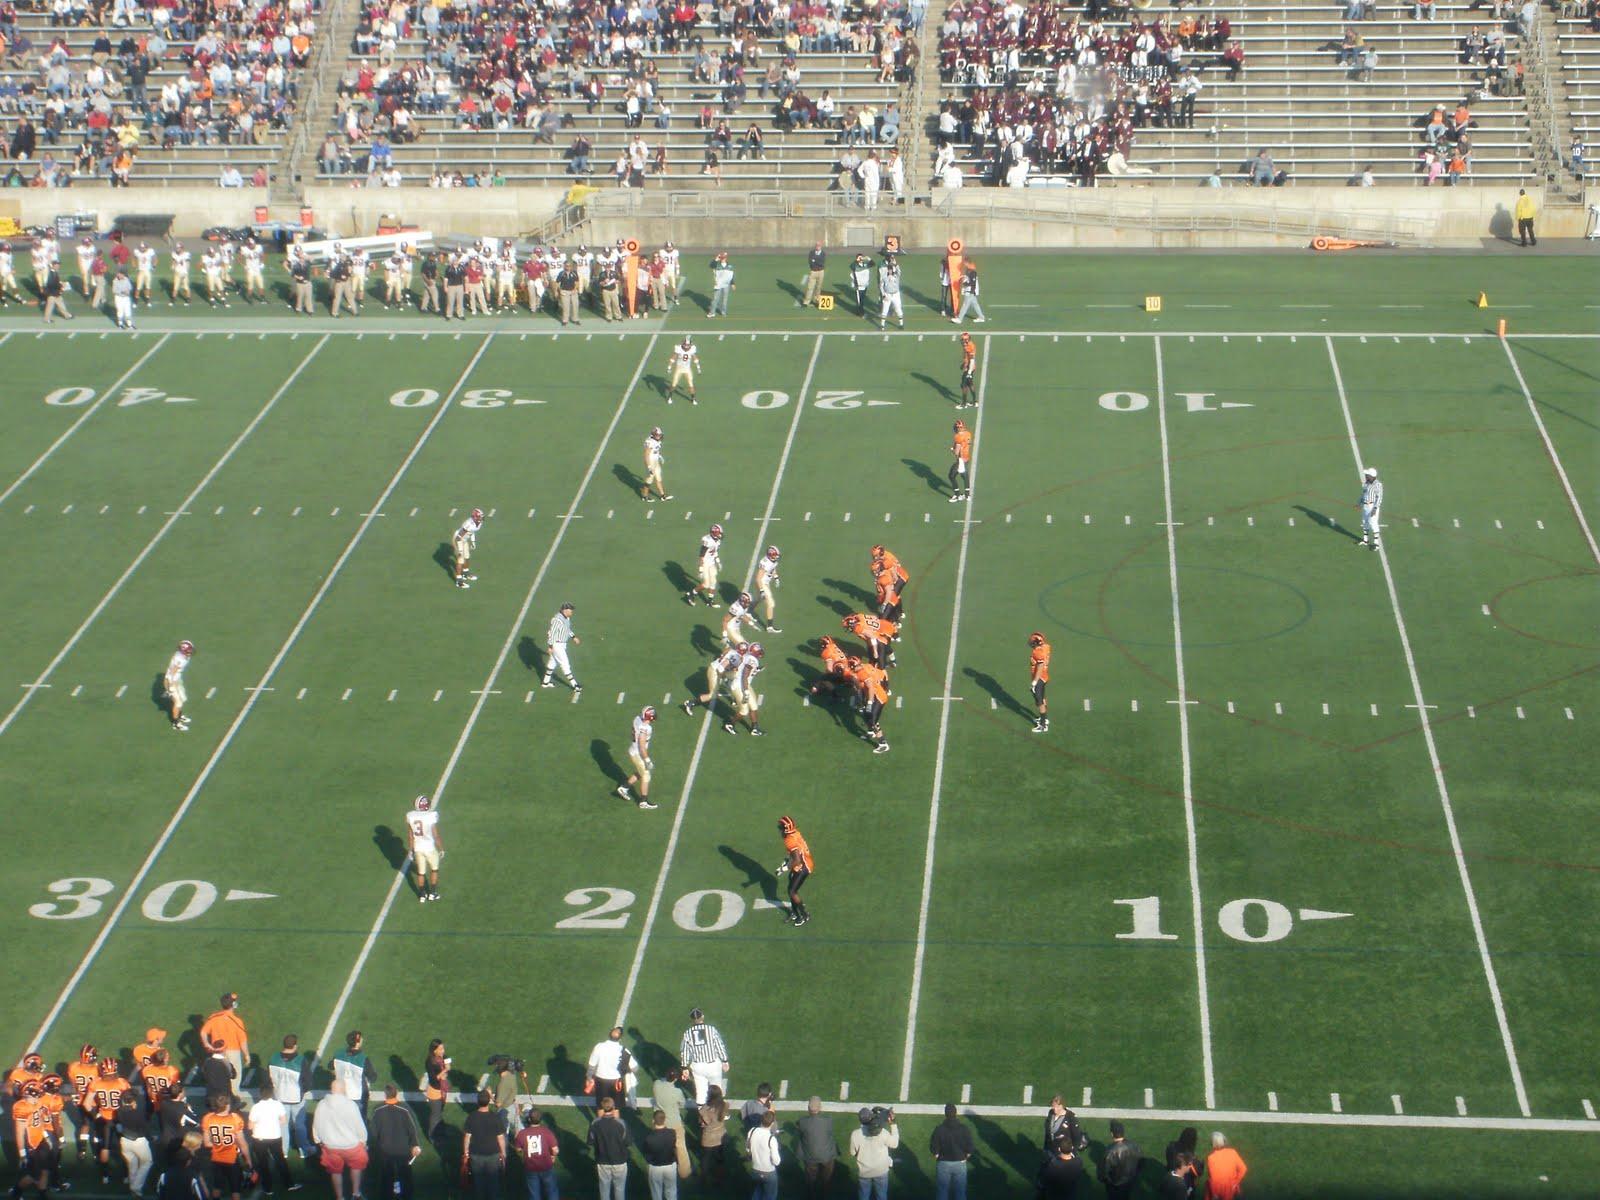 WHRB Sports Blog: Photo-Blog: WHRB goes to Princeton, NJ